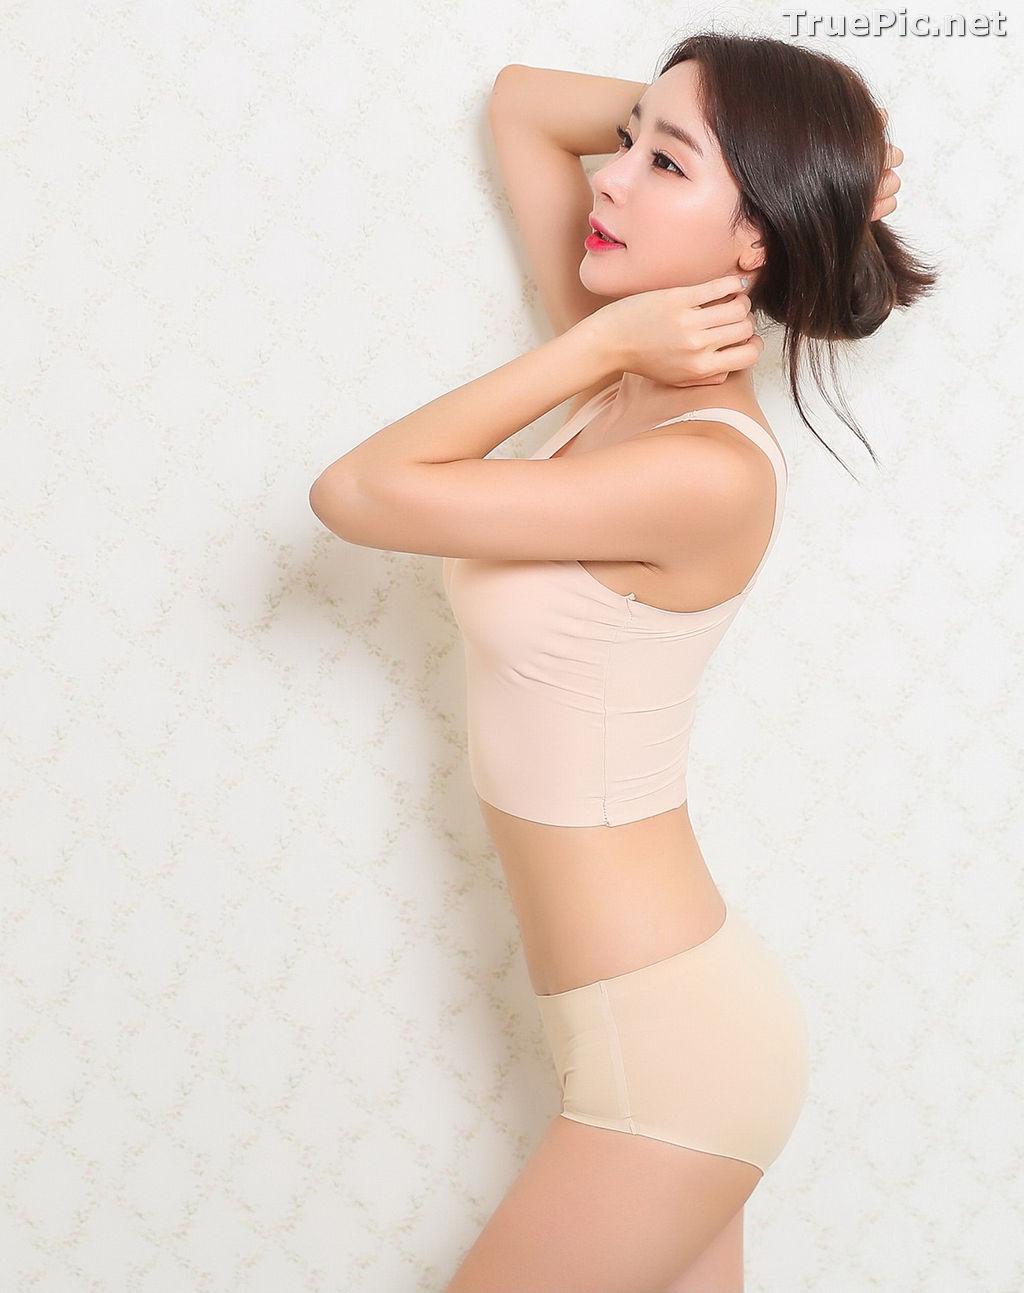 Image Hyun Kyung - Korean Fashion Model - Nude Color Undies - TruePic.net - Picture-1